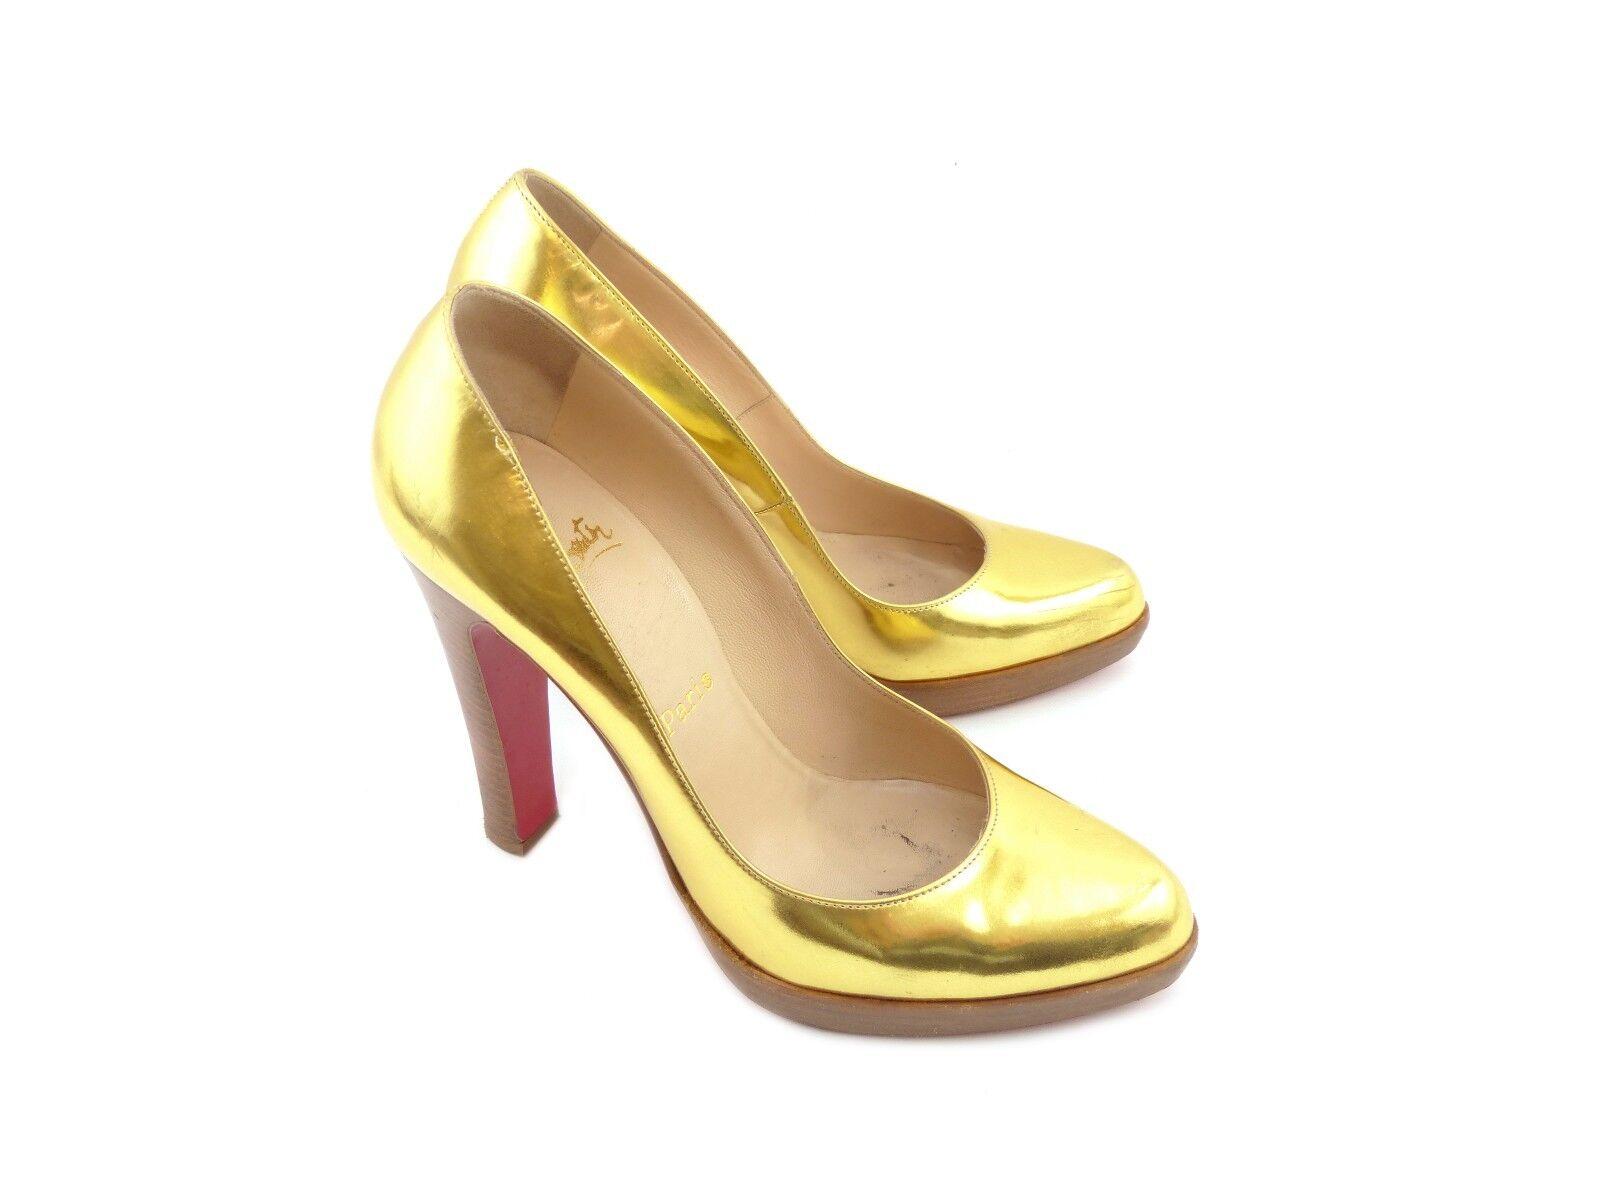 Zapatos casuales salvajes Christian Louboutin Super Escote 868 oro Specchio Cuero [42% APAGADO PVP]